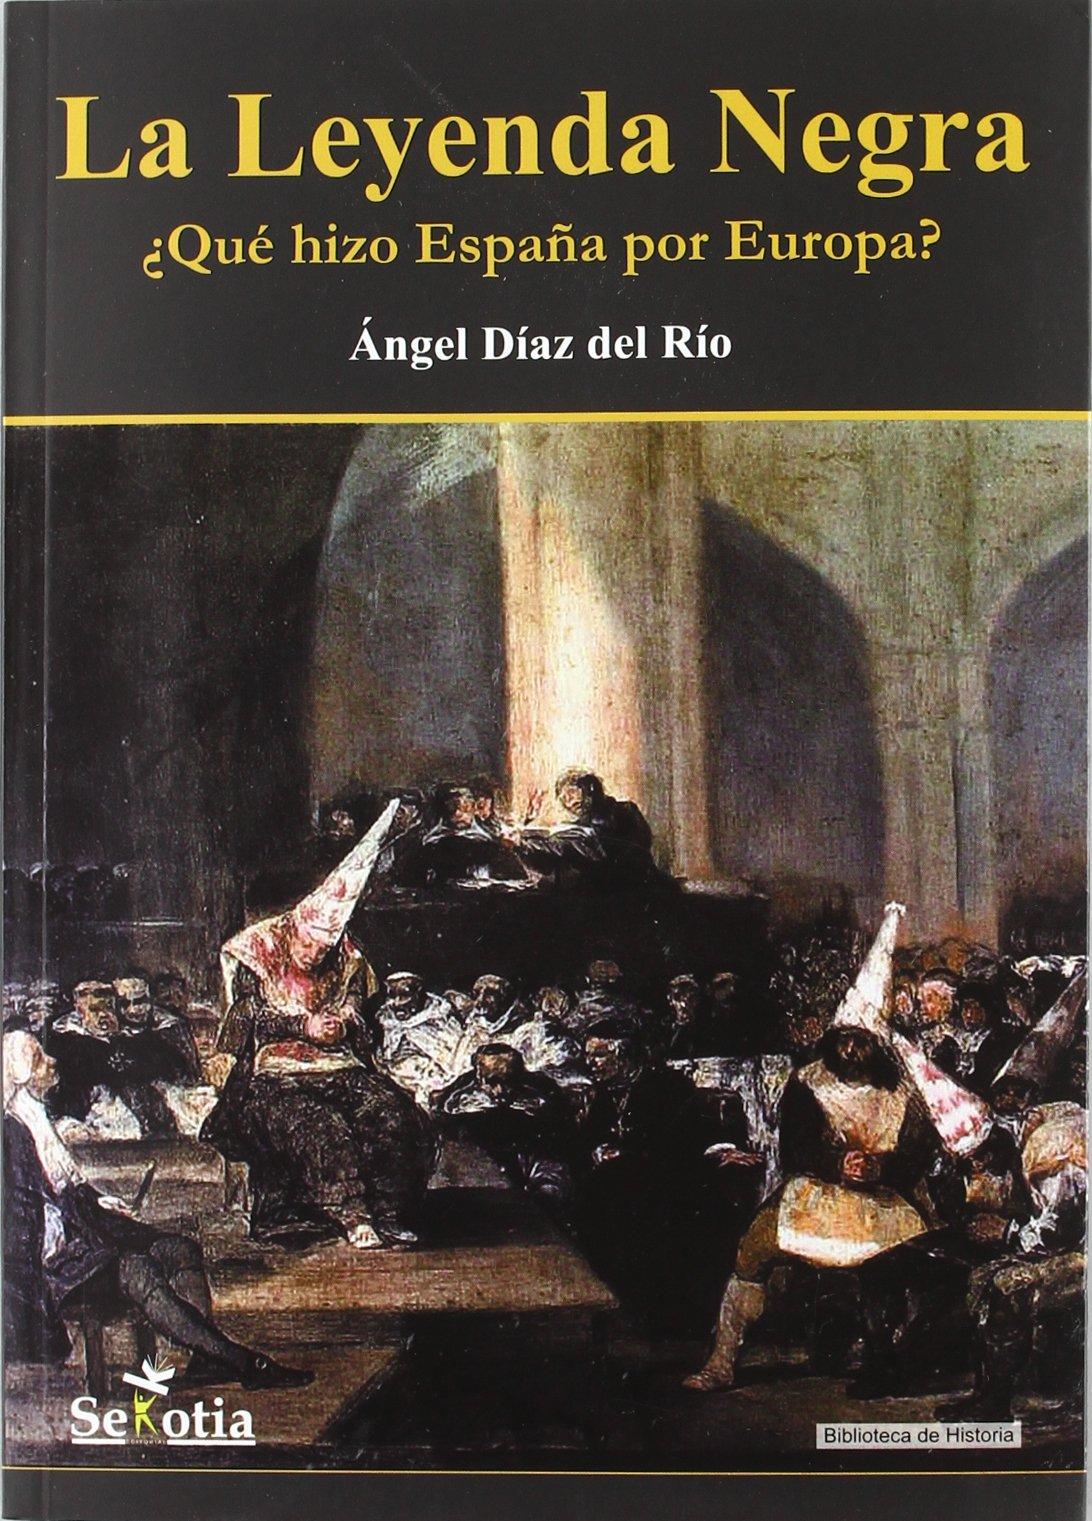 Leyenda negra, la - ¿que hizo España por Europa? (Biblioteca De Historia) Tapa blanda – 15 dic 2011 A.L. Diaz Del Rio Martinez Sekotia S.L. 8496899918